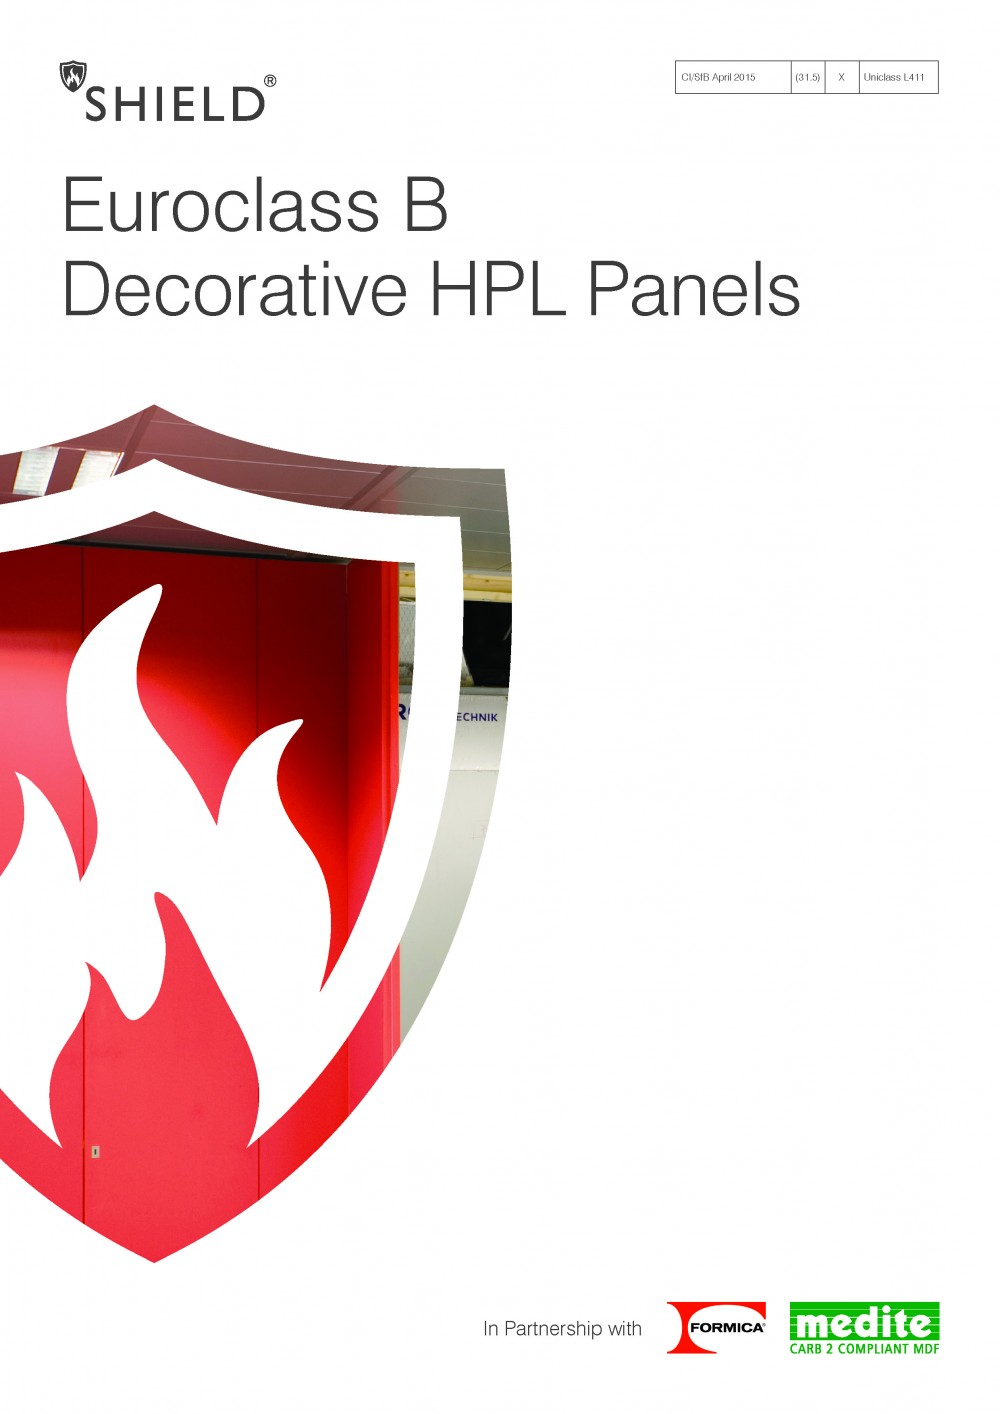 Euroclass B decorative HPL panel